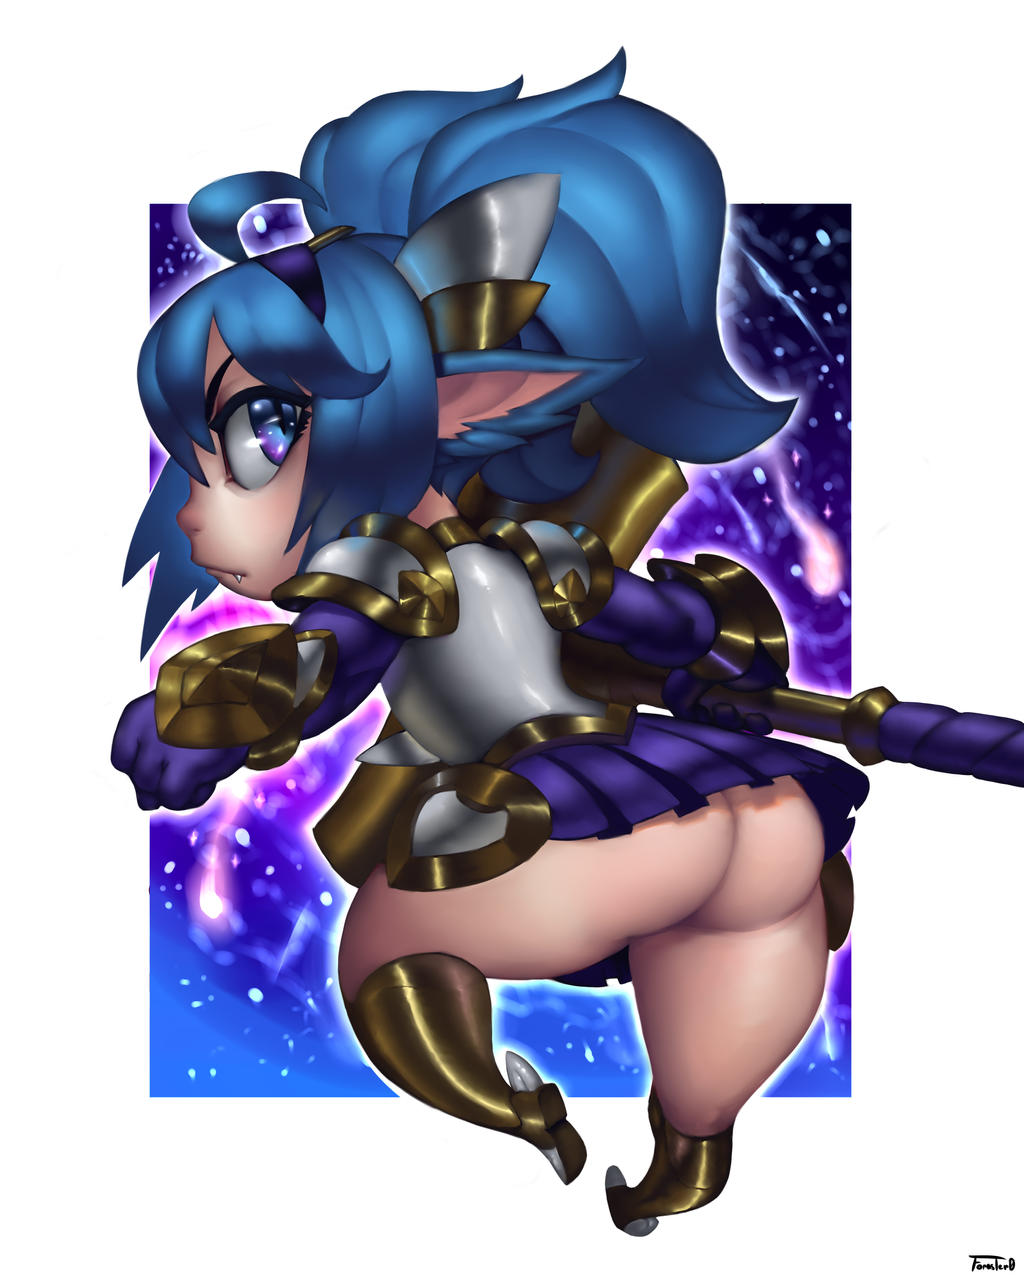 LOL - star Guardian Poppy by Foraster0